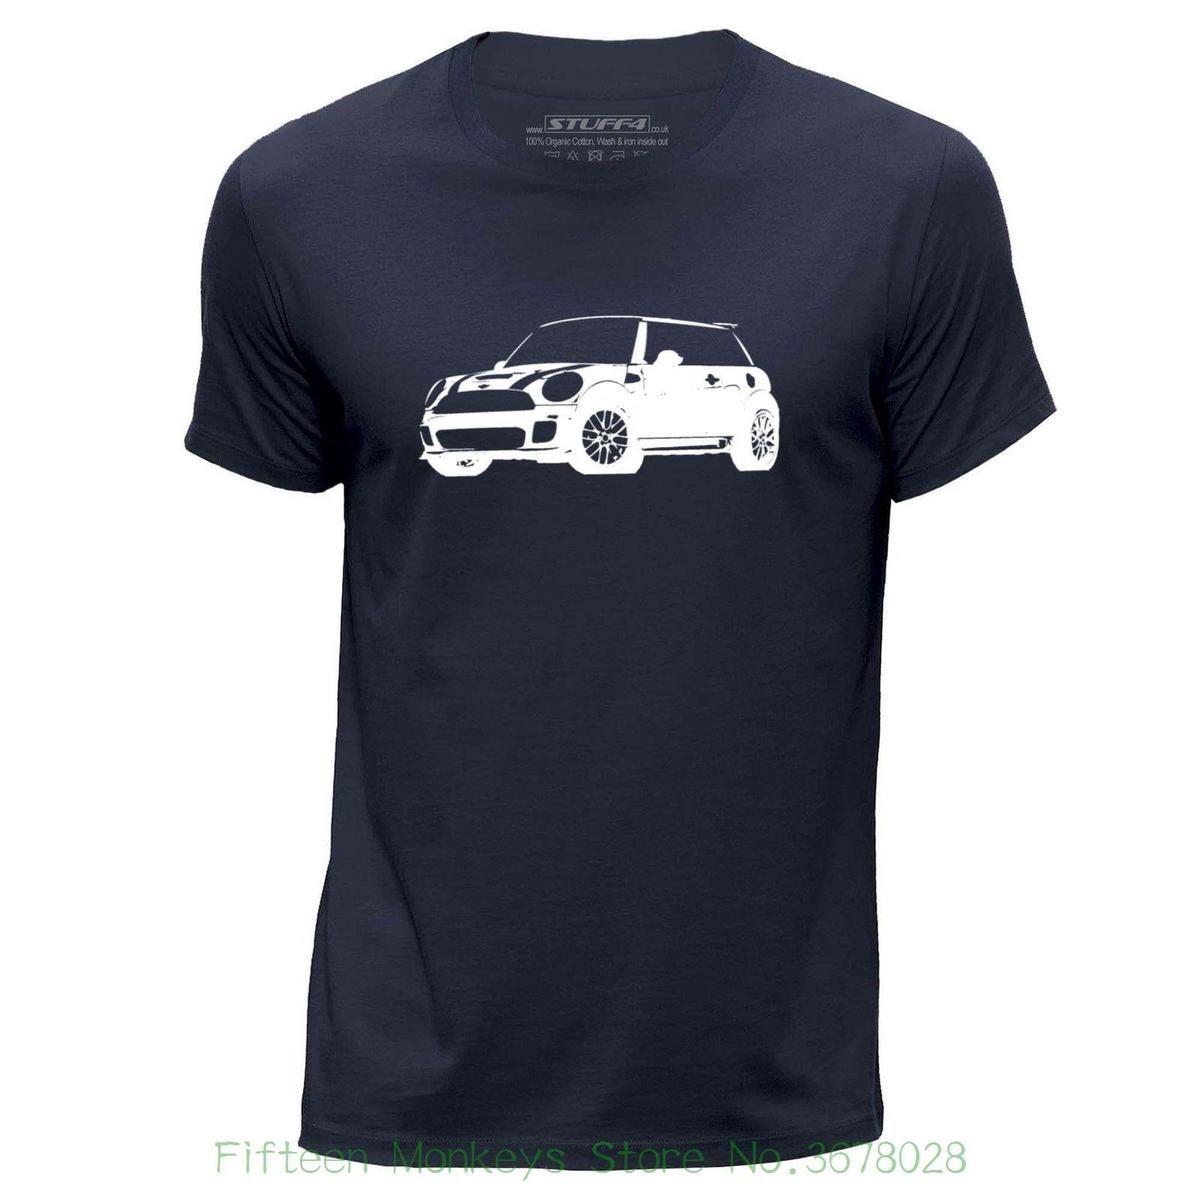 079323cad8a Loose Black Men Tshirts Homme Tees Stuff4 Hommes Bleu Marin Col Rond T Shirt  Stencil Art De Voiture Cooper S Sz 24 Hour Tee Shirts T Shirts T Shirts  From ...